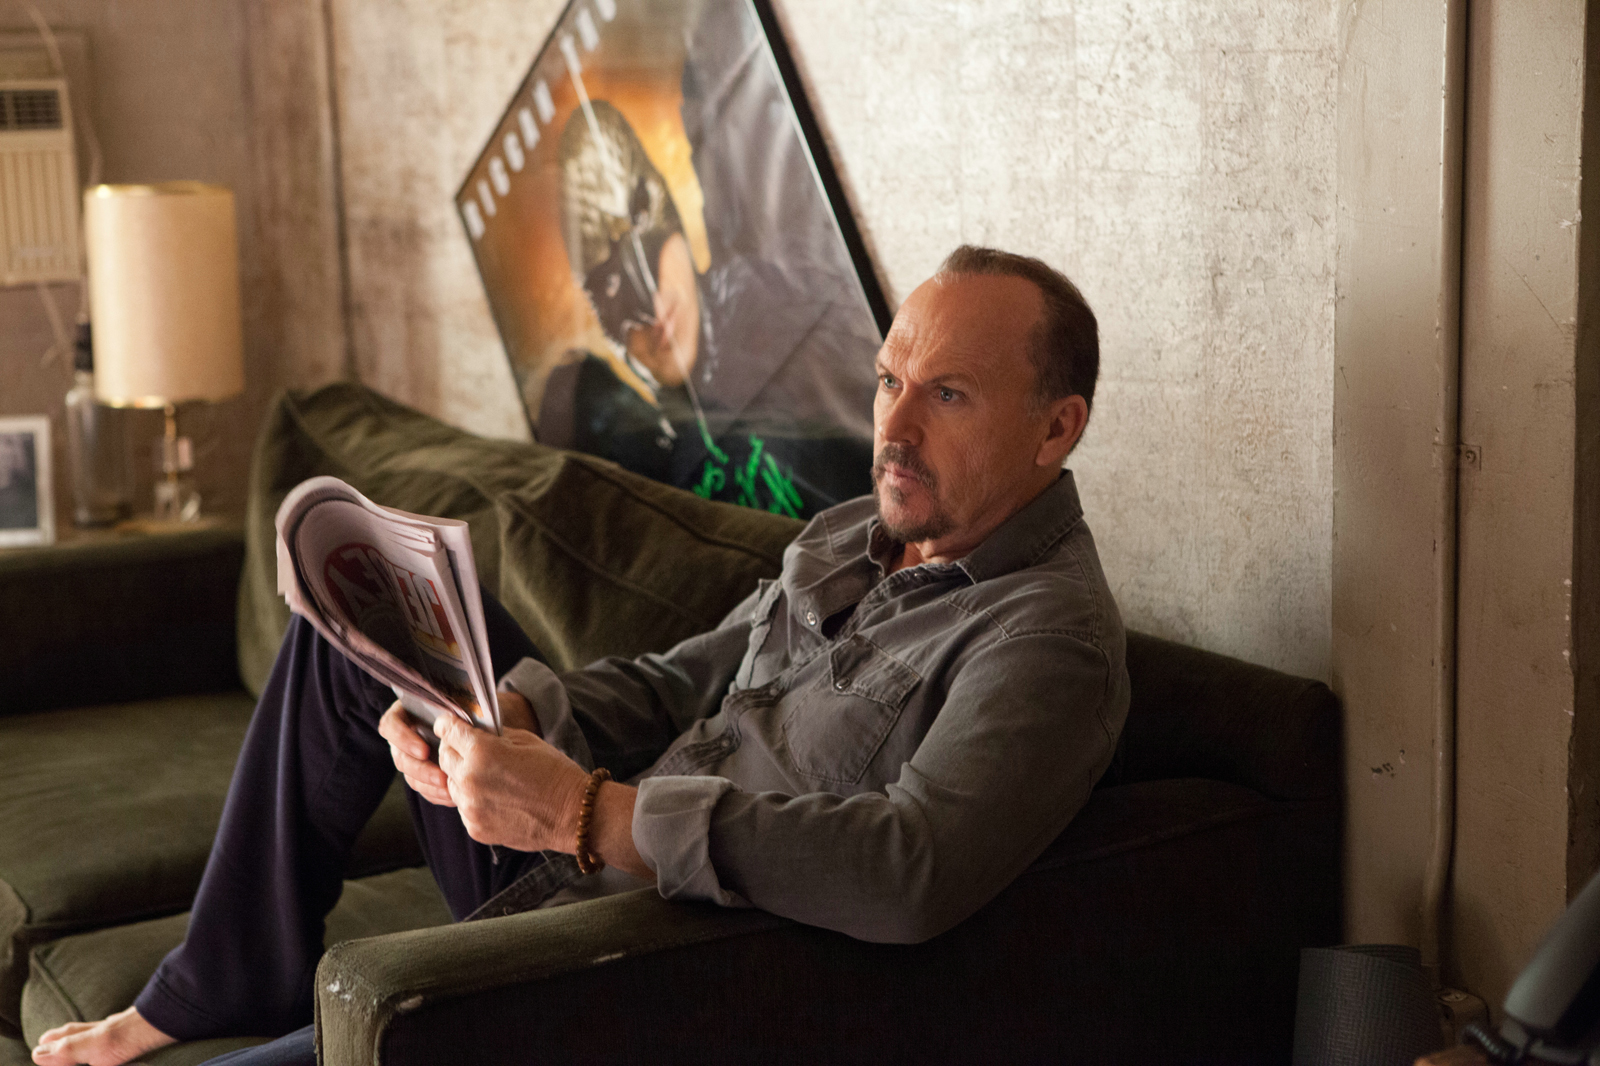 Michael Keaton. Birdman Le ciné d'Alain